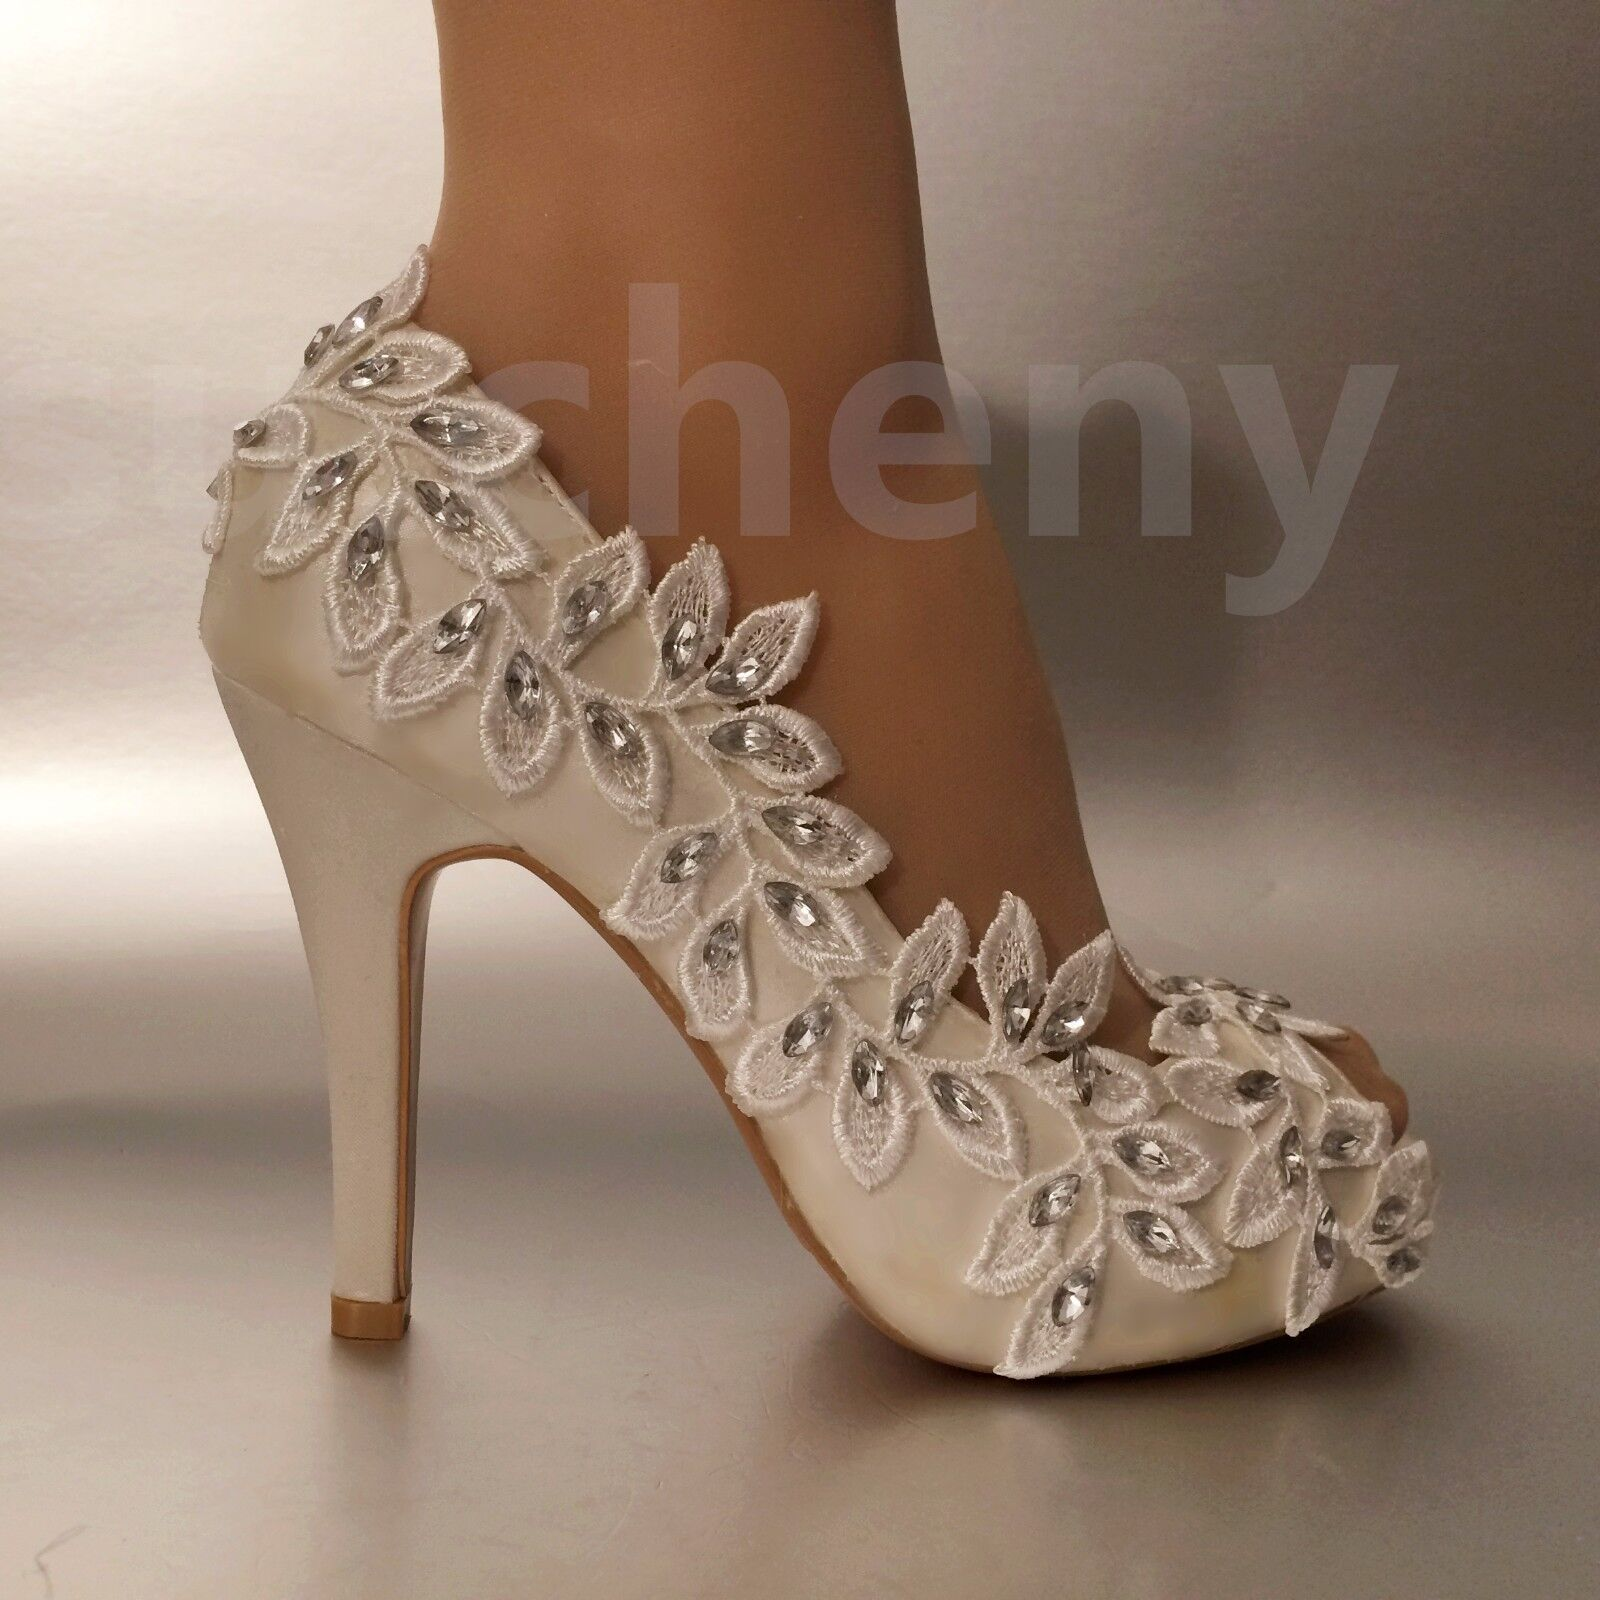 Su.cheny 3 3 3  4  heel white ivory lace Olive branch open toe Wedding Bridal shoes 5e1f82